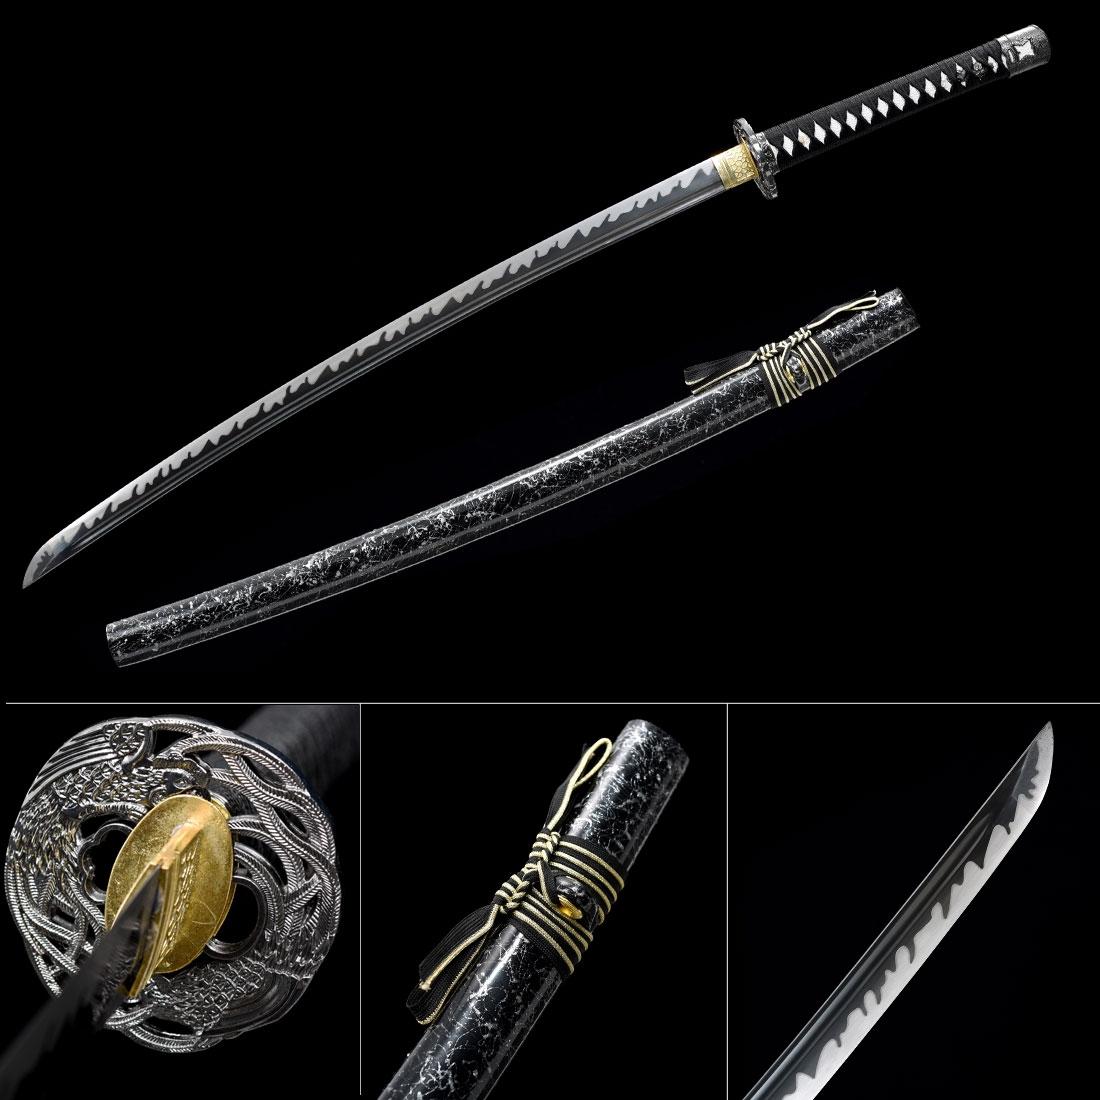 Black Blade Katana Sword, Handmade Japanese Katana Samurai Swords With Black Scabbard